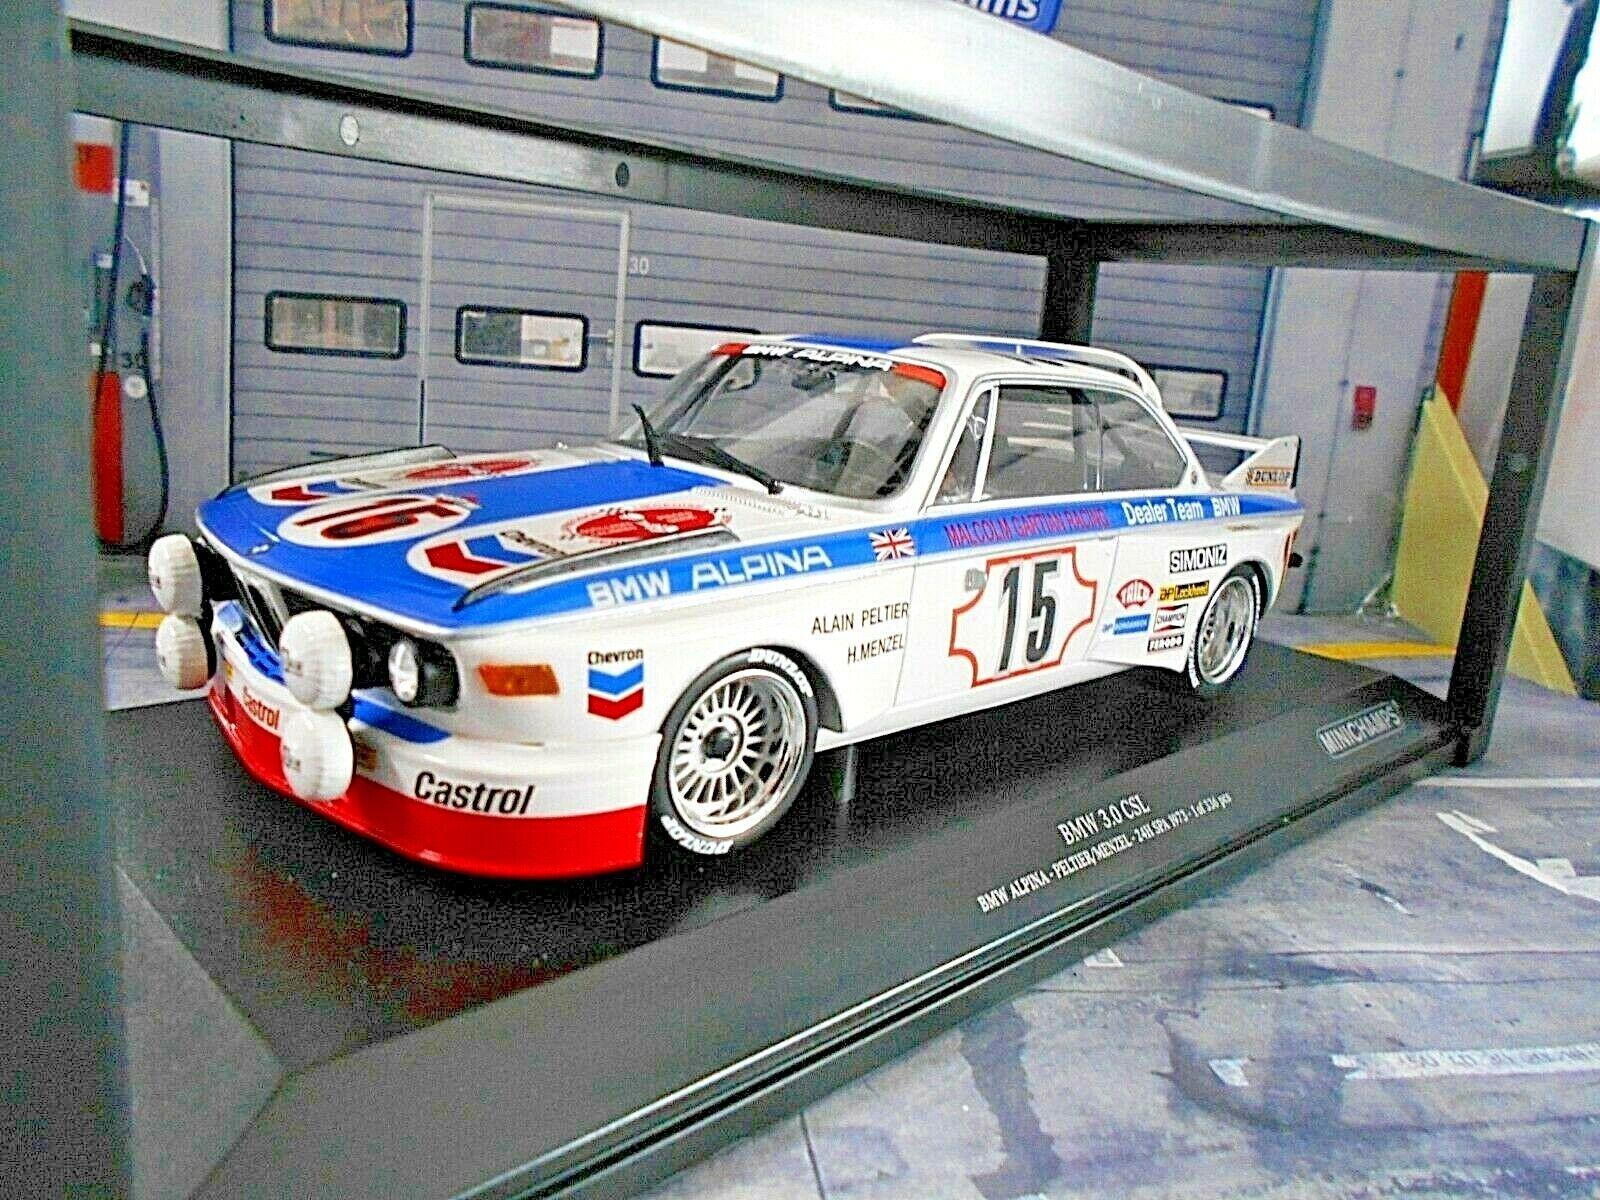 bienvenido a comprar Bmw 3.0 3.0 3.0 CSL 24h spa 1973  15 Peltier Menzel alpina dealer Chevro Minichamps 1 18  Precio por piso